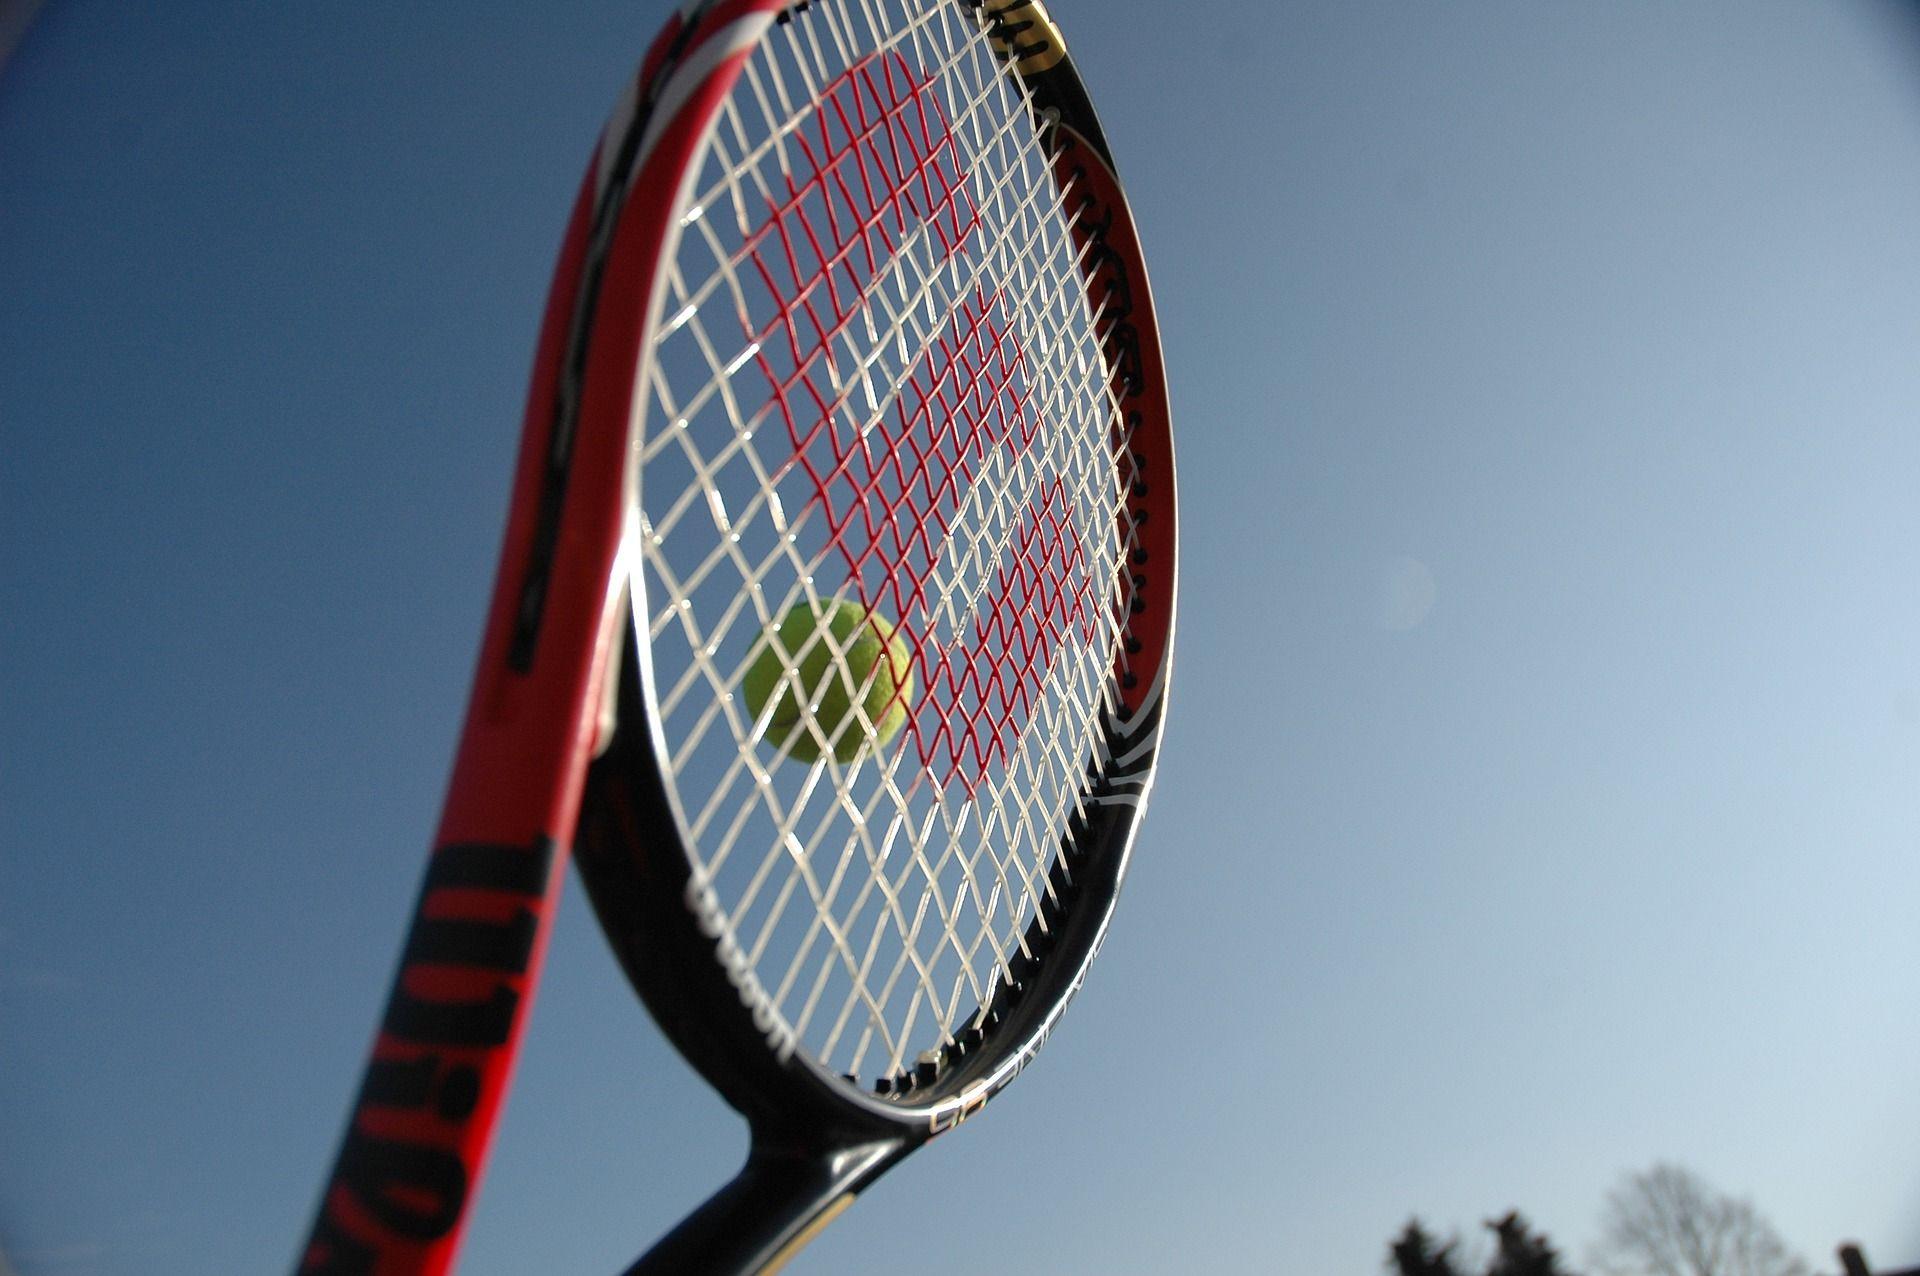 Best Tennis Racquets for Beginners 2020 A Practical